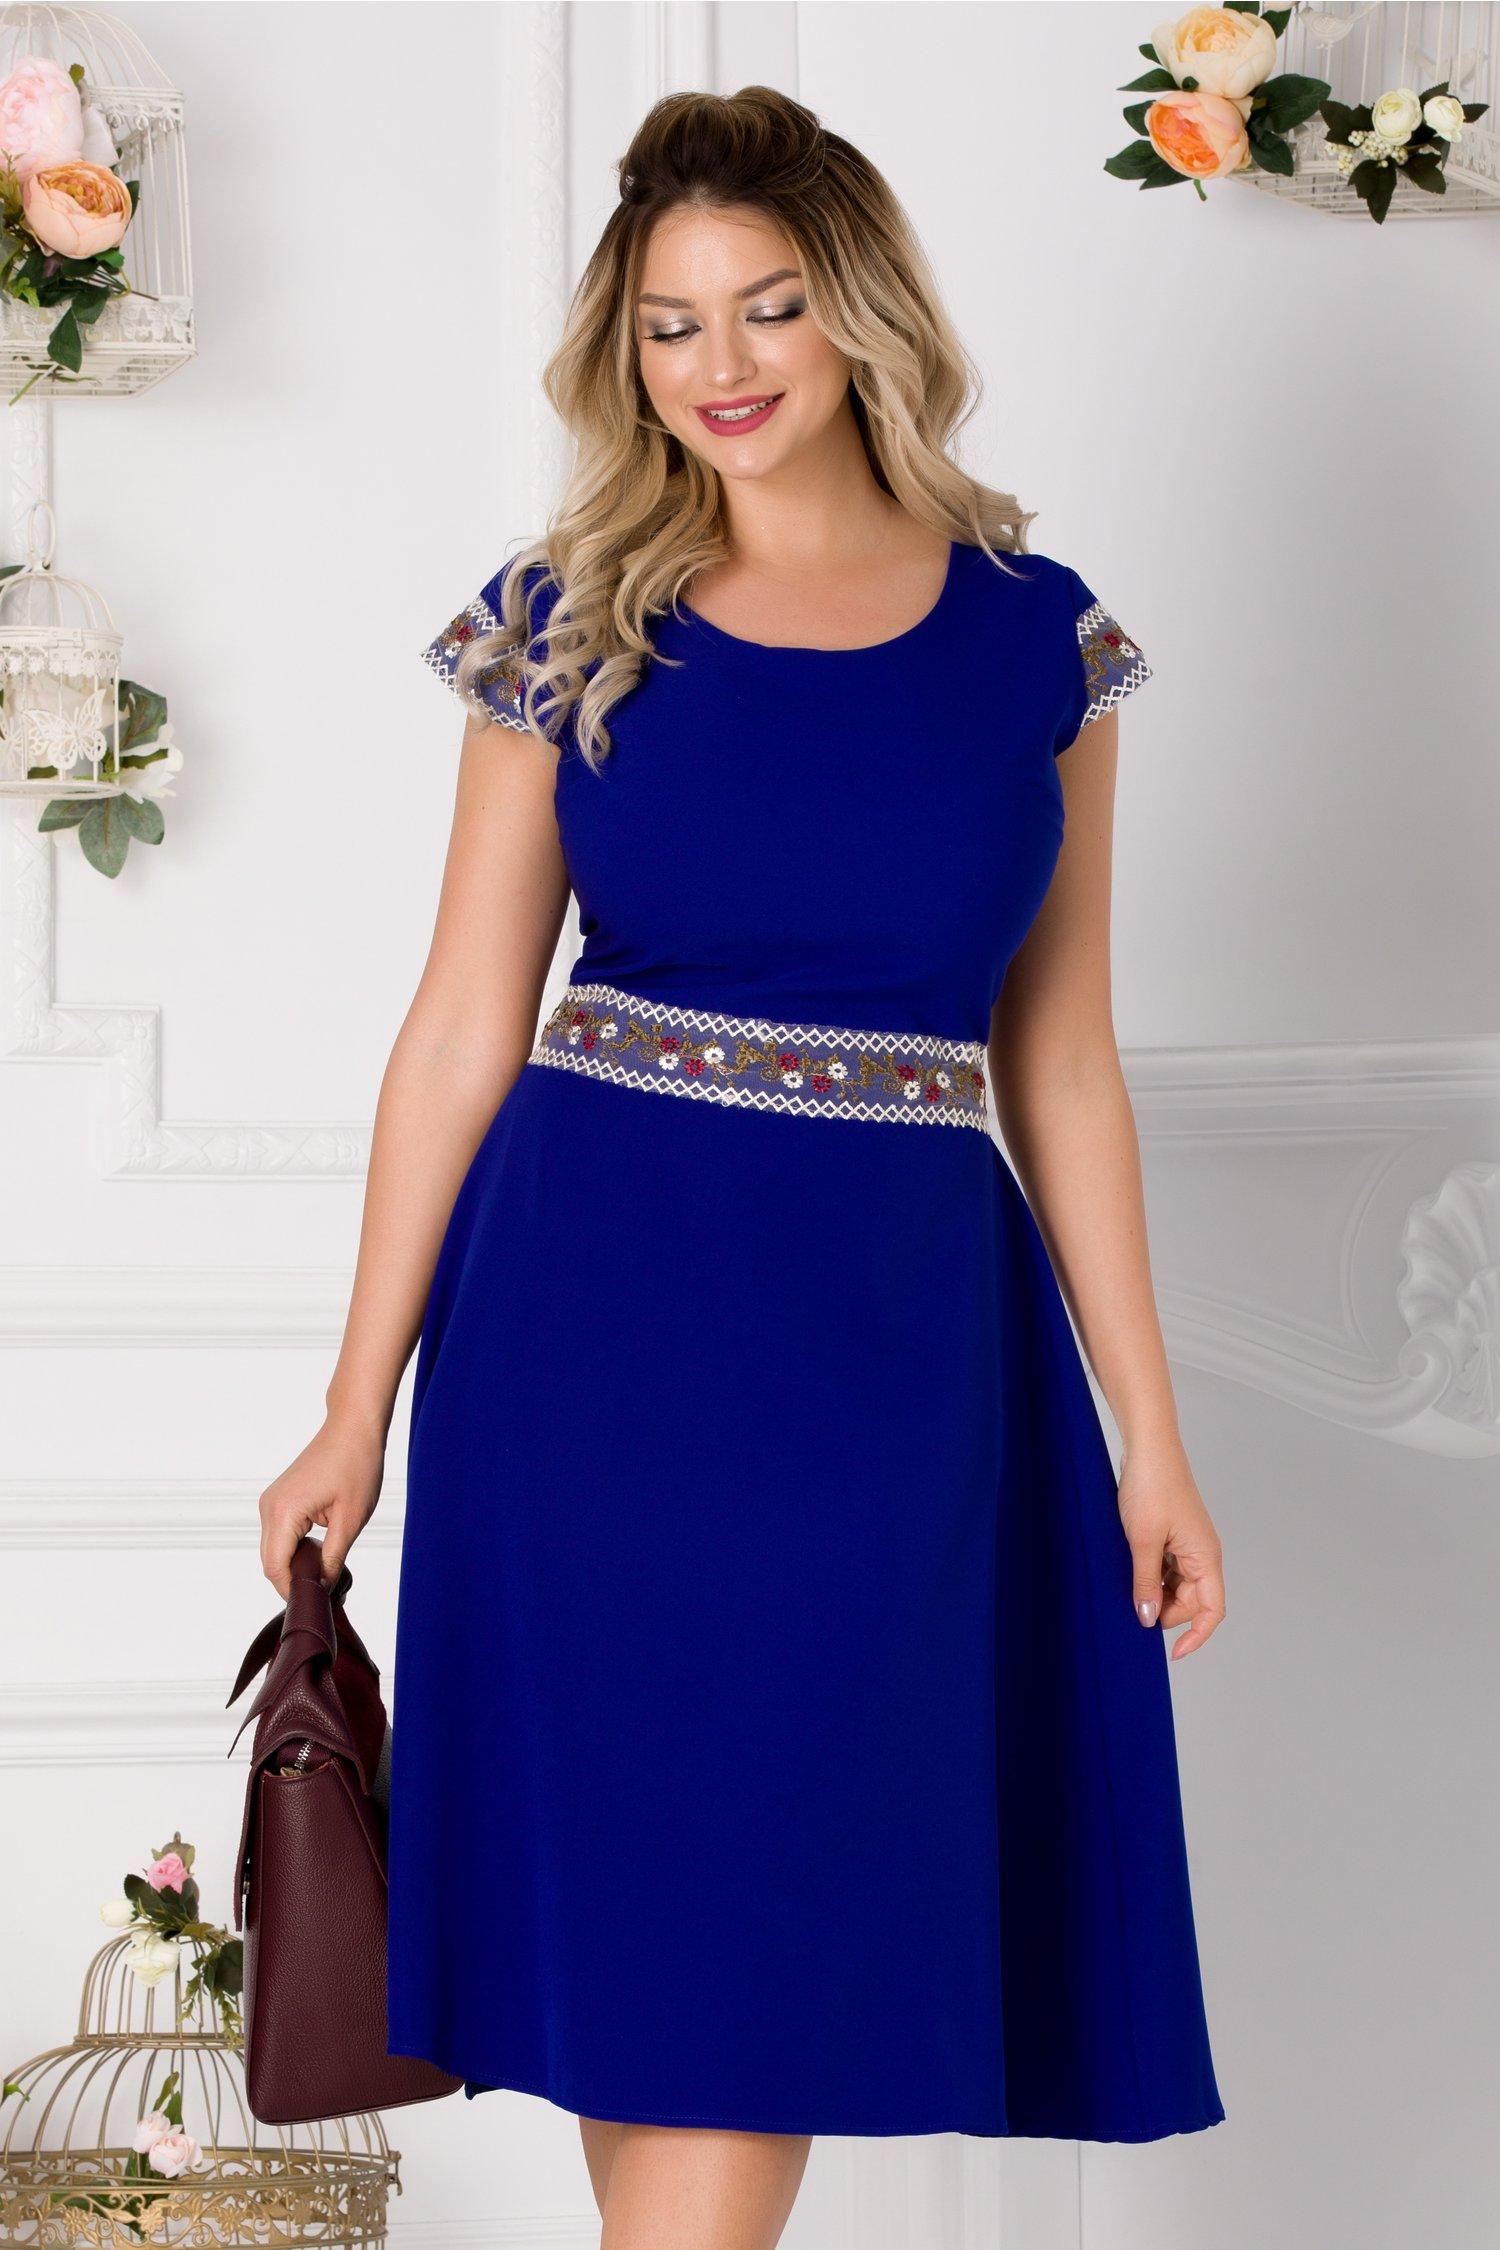 Rochie Coco albastra cu broderie florala in talie si la maneci